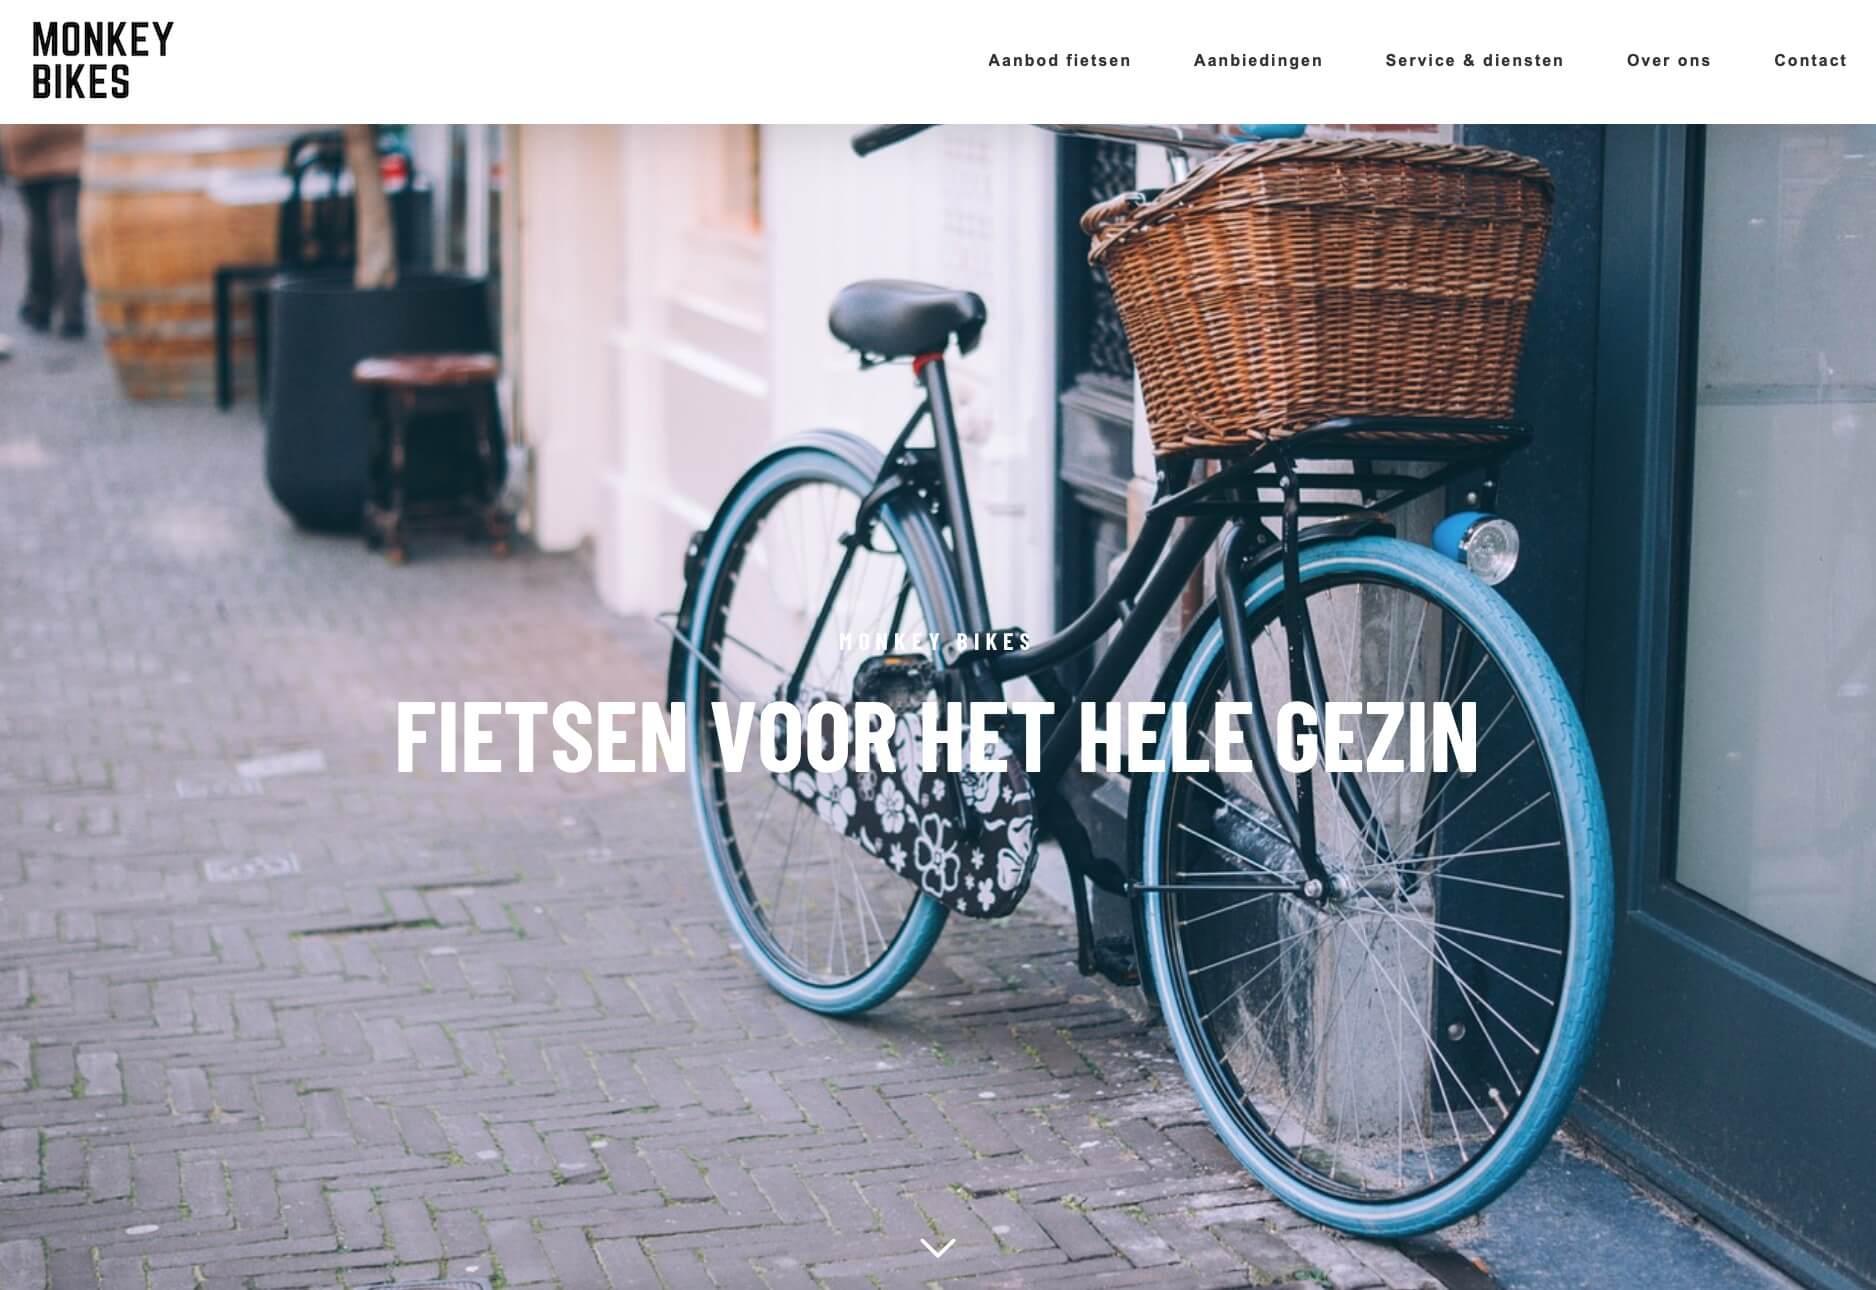 Kinderfietsen_en_stadsfietsen_Almelo_-_Monkey_Bikes - Website realisatie: Obviousmedia.nl